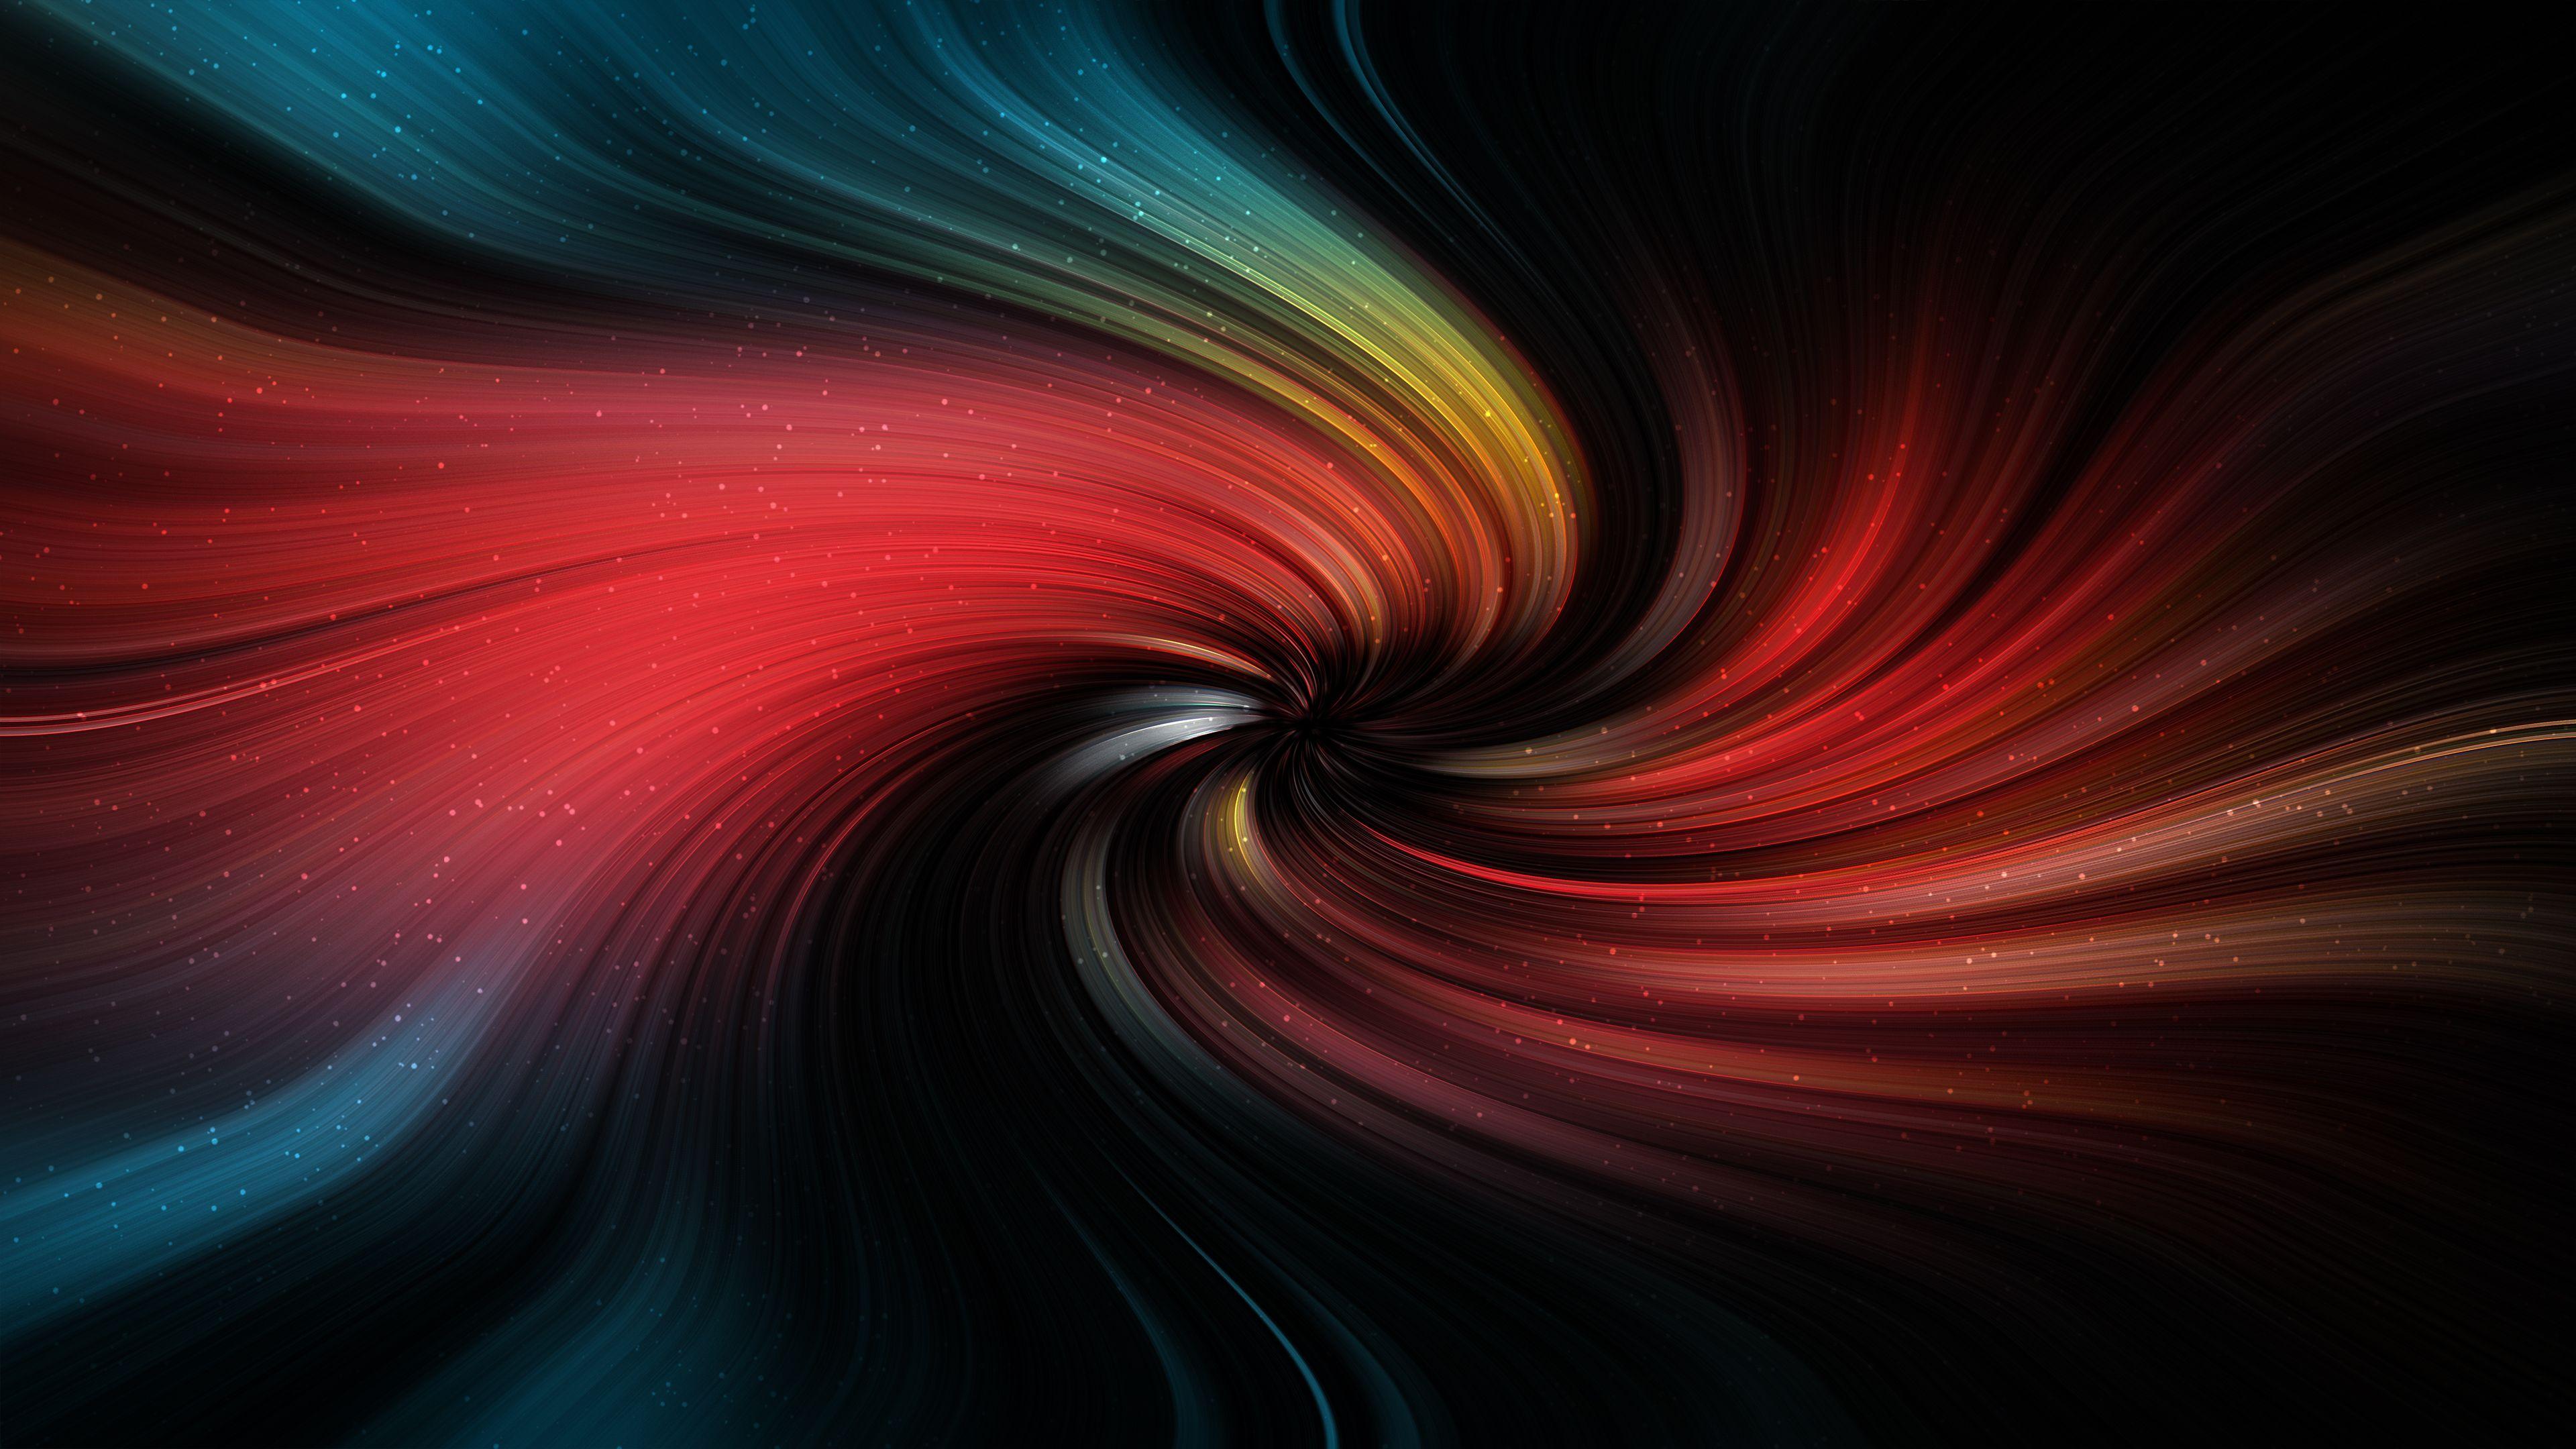 Swirl Abstract Art In 2020 Abstract Abstract Art Abstract Wallpaper